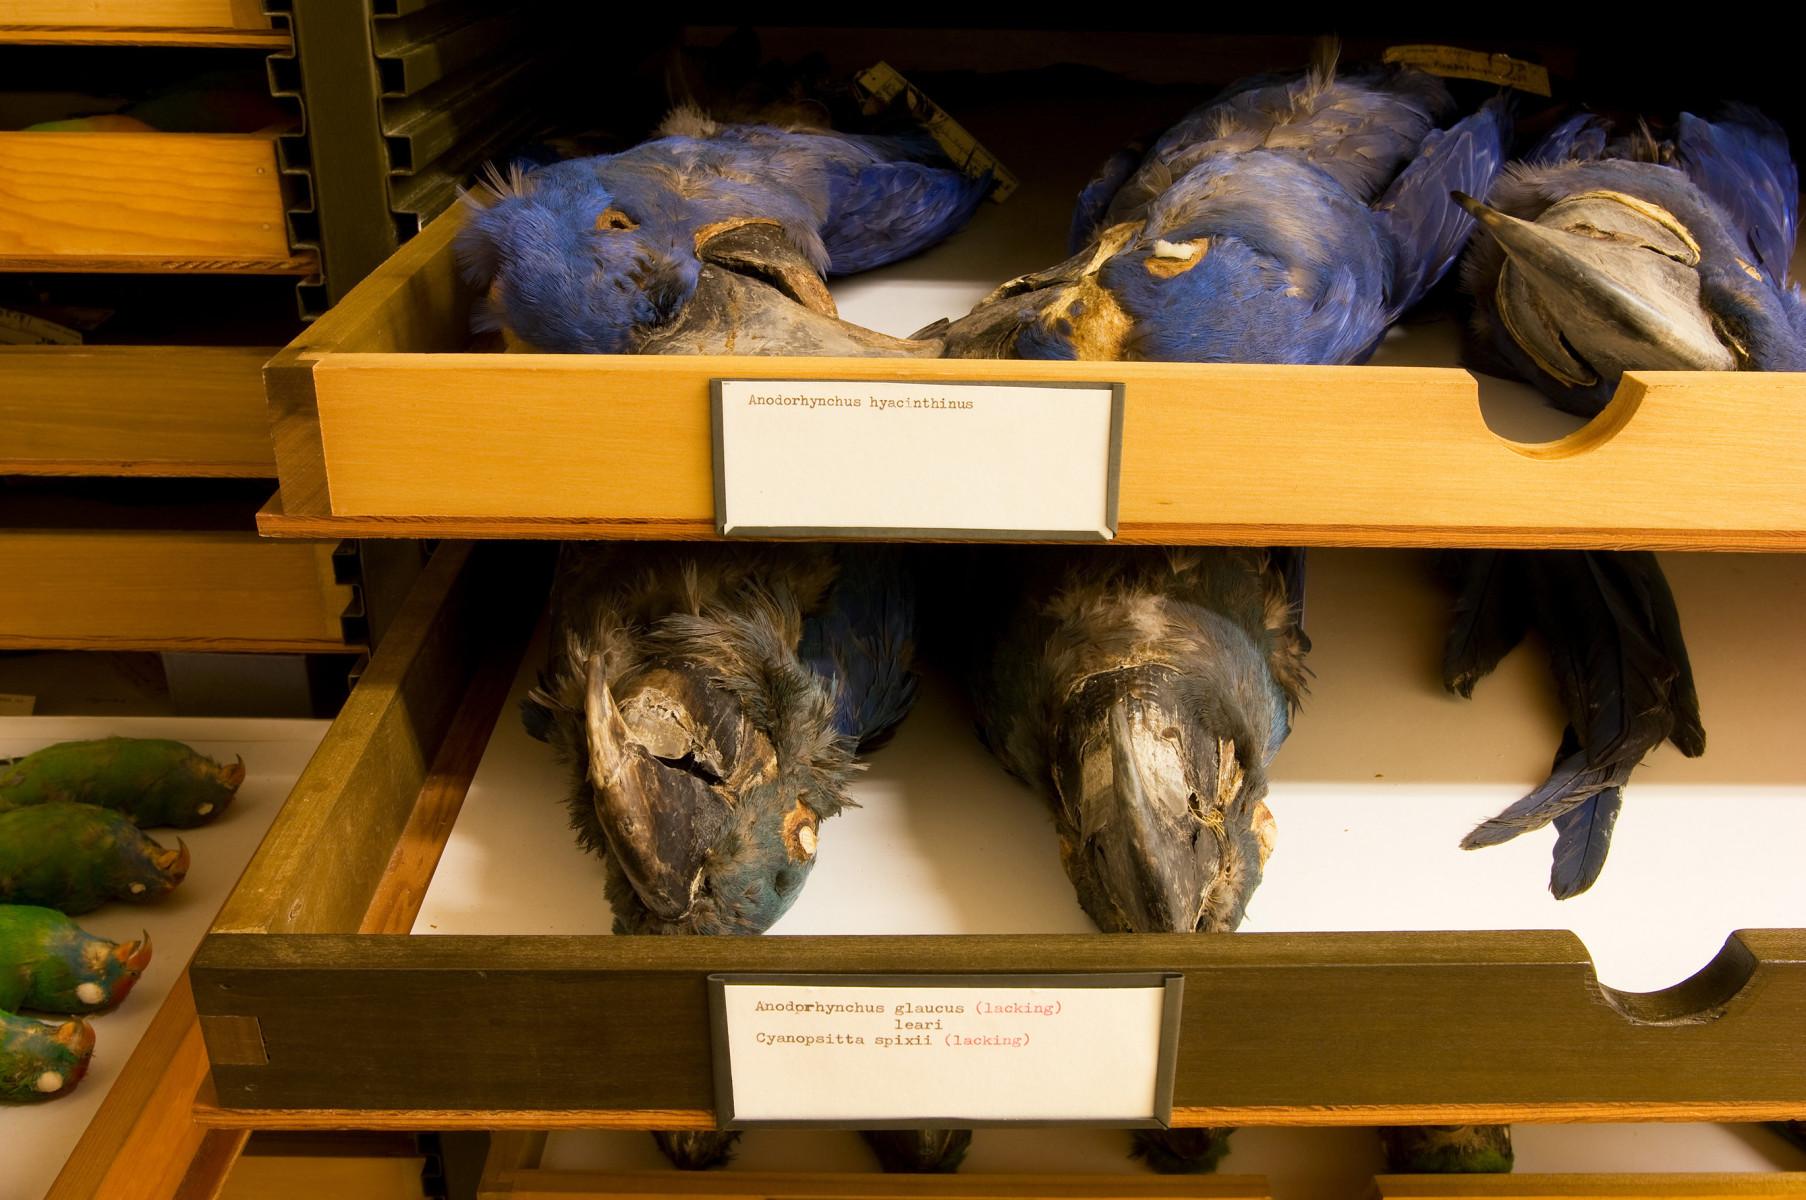 Hyacinth macaw bird Anodorhynchus hyacinthinus - Extinction